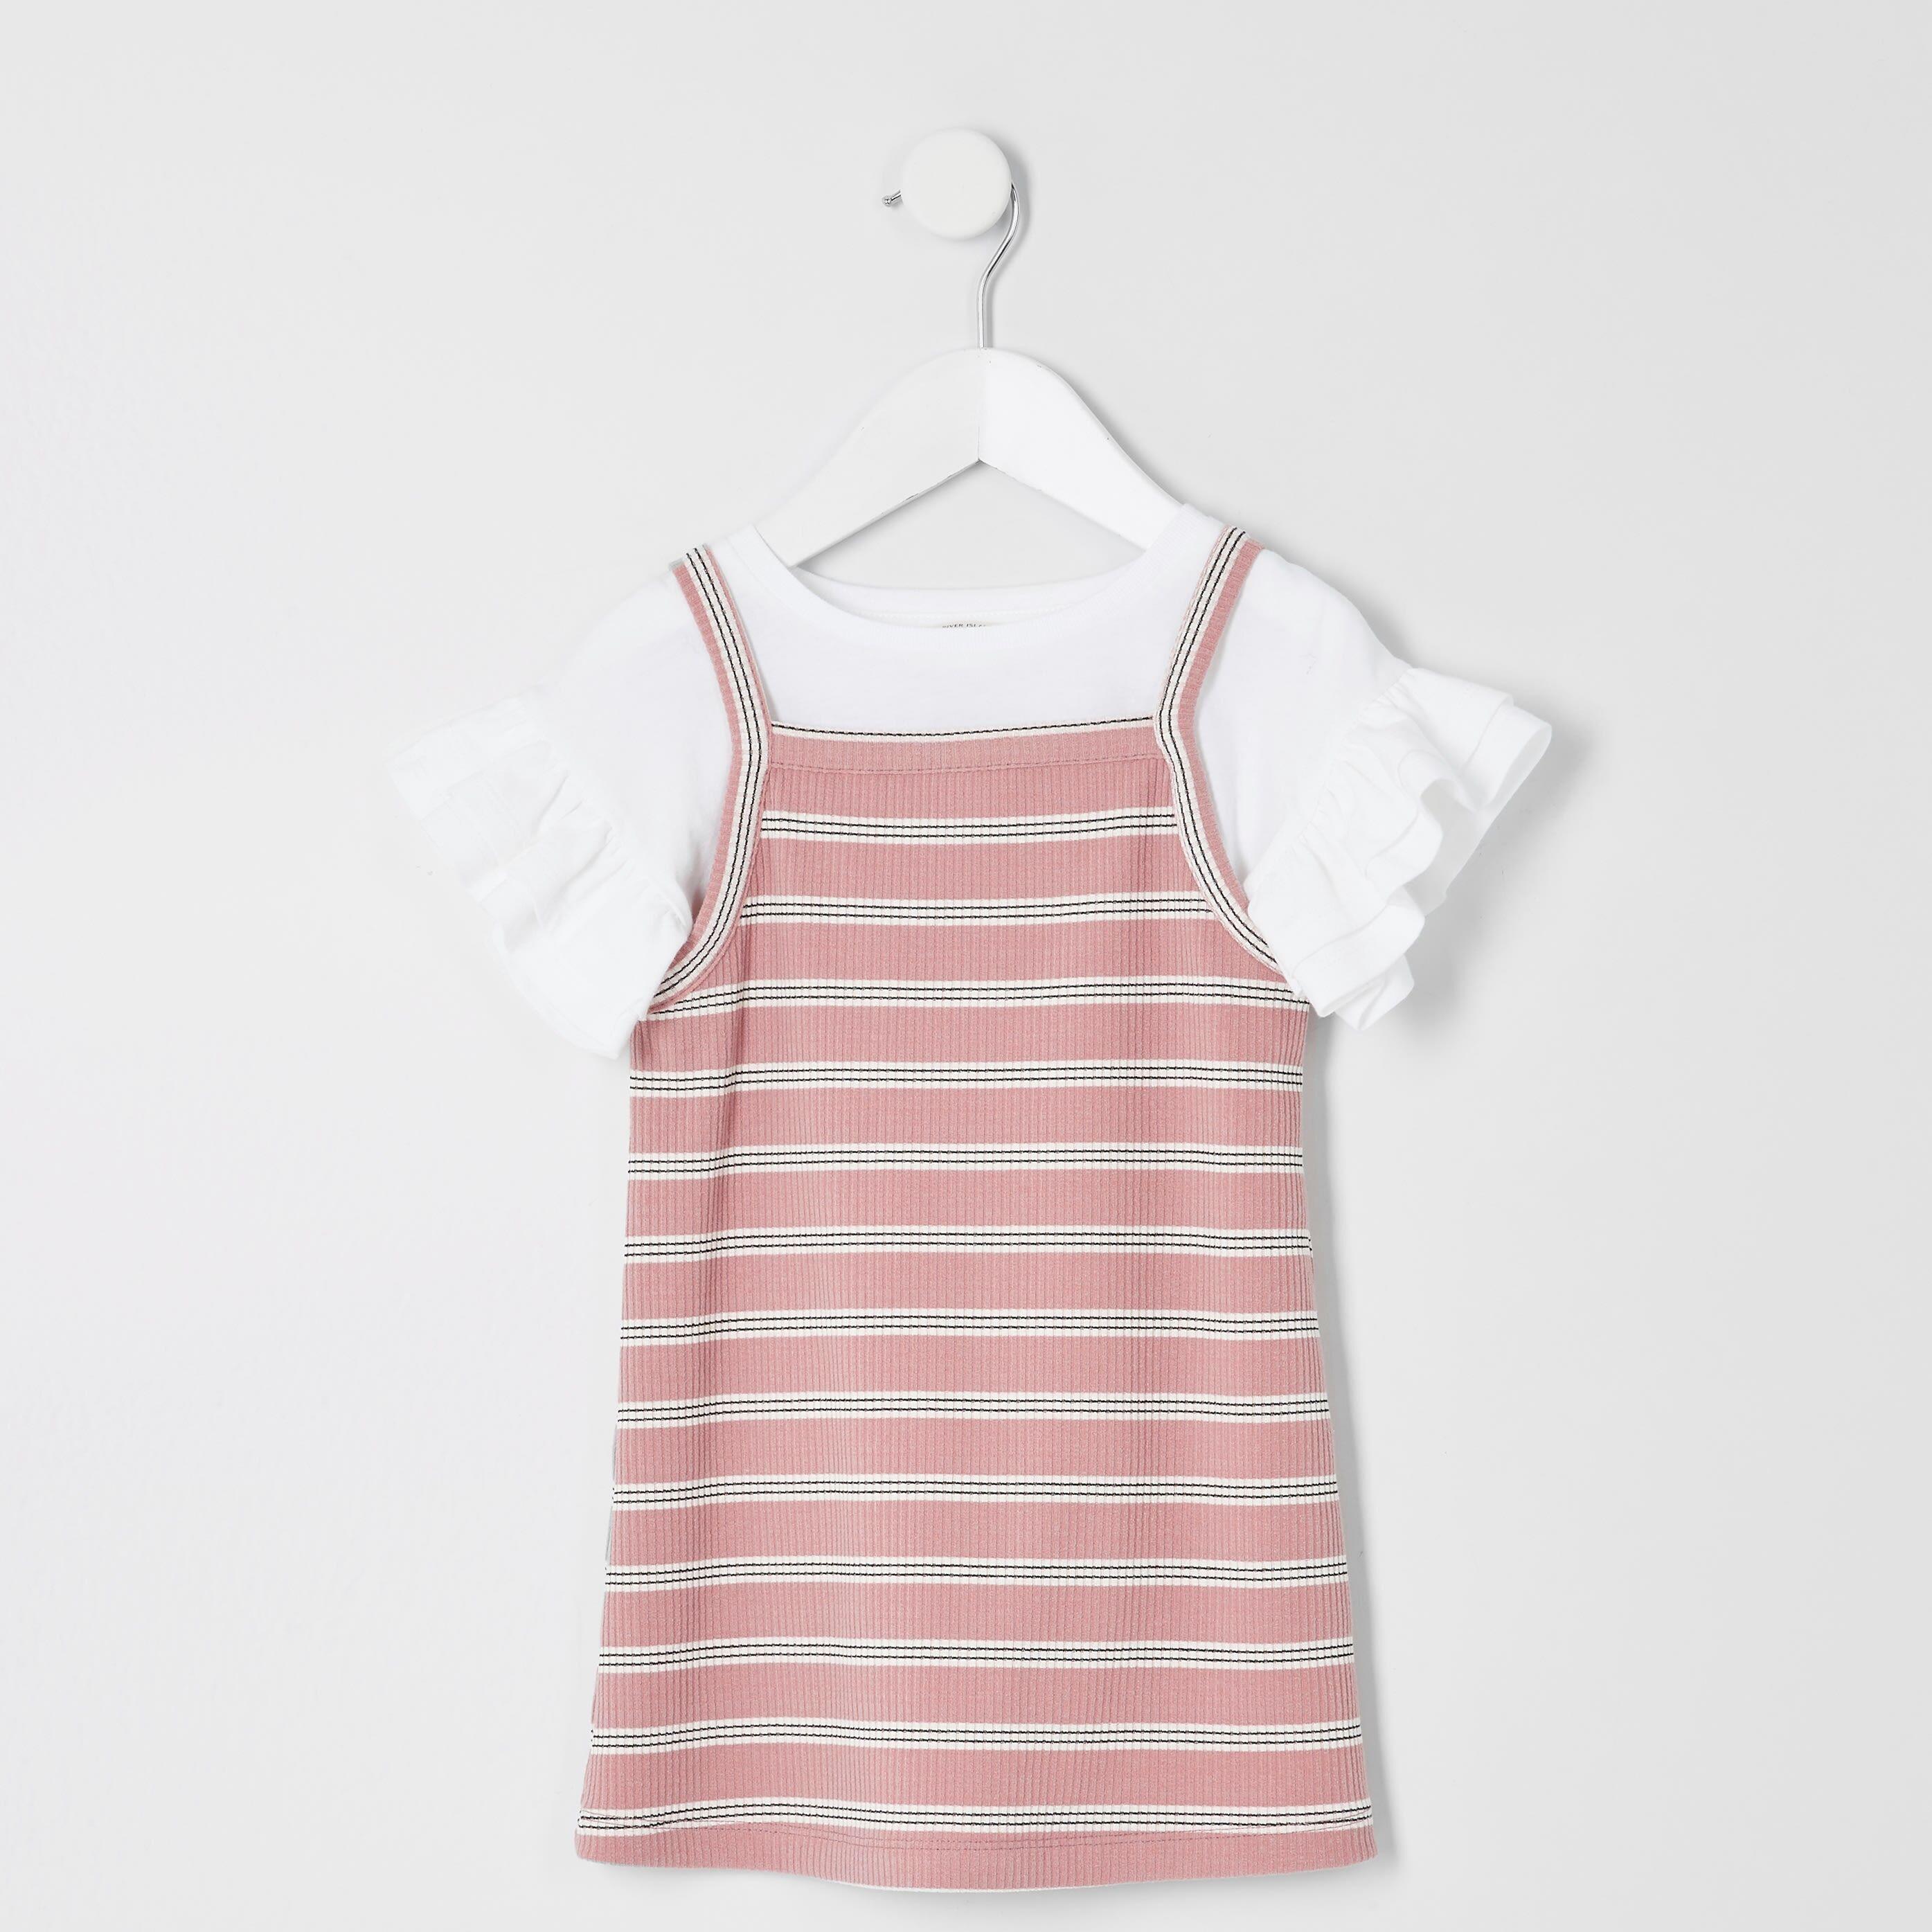 River Island Baby Girls 2 in 1 Pink stripe T-shirt dress (6-9 Mths)